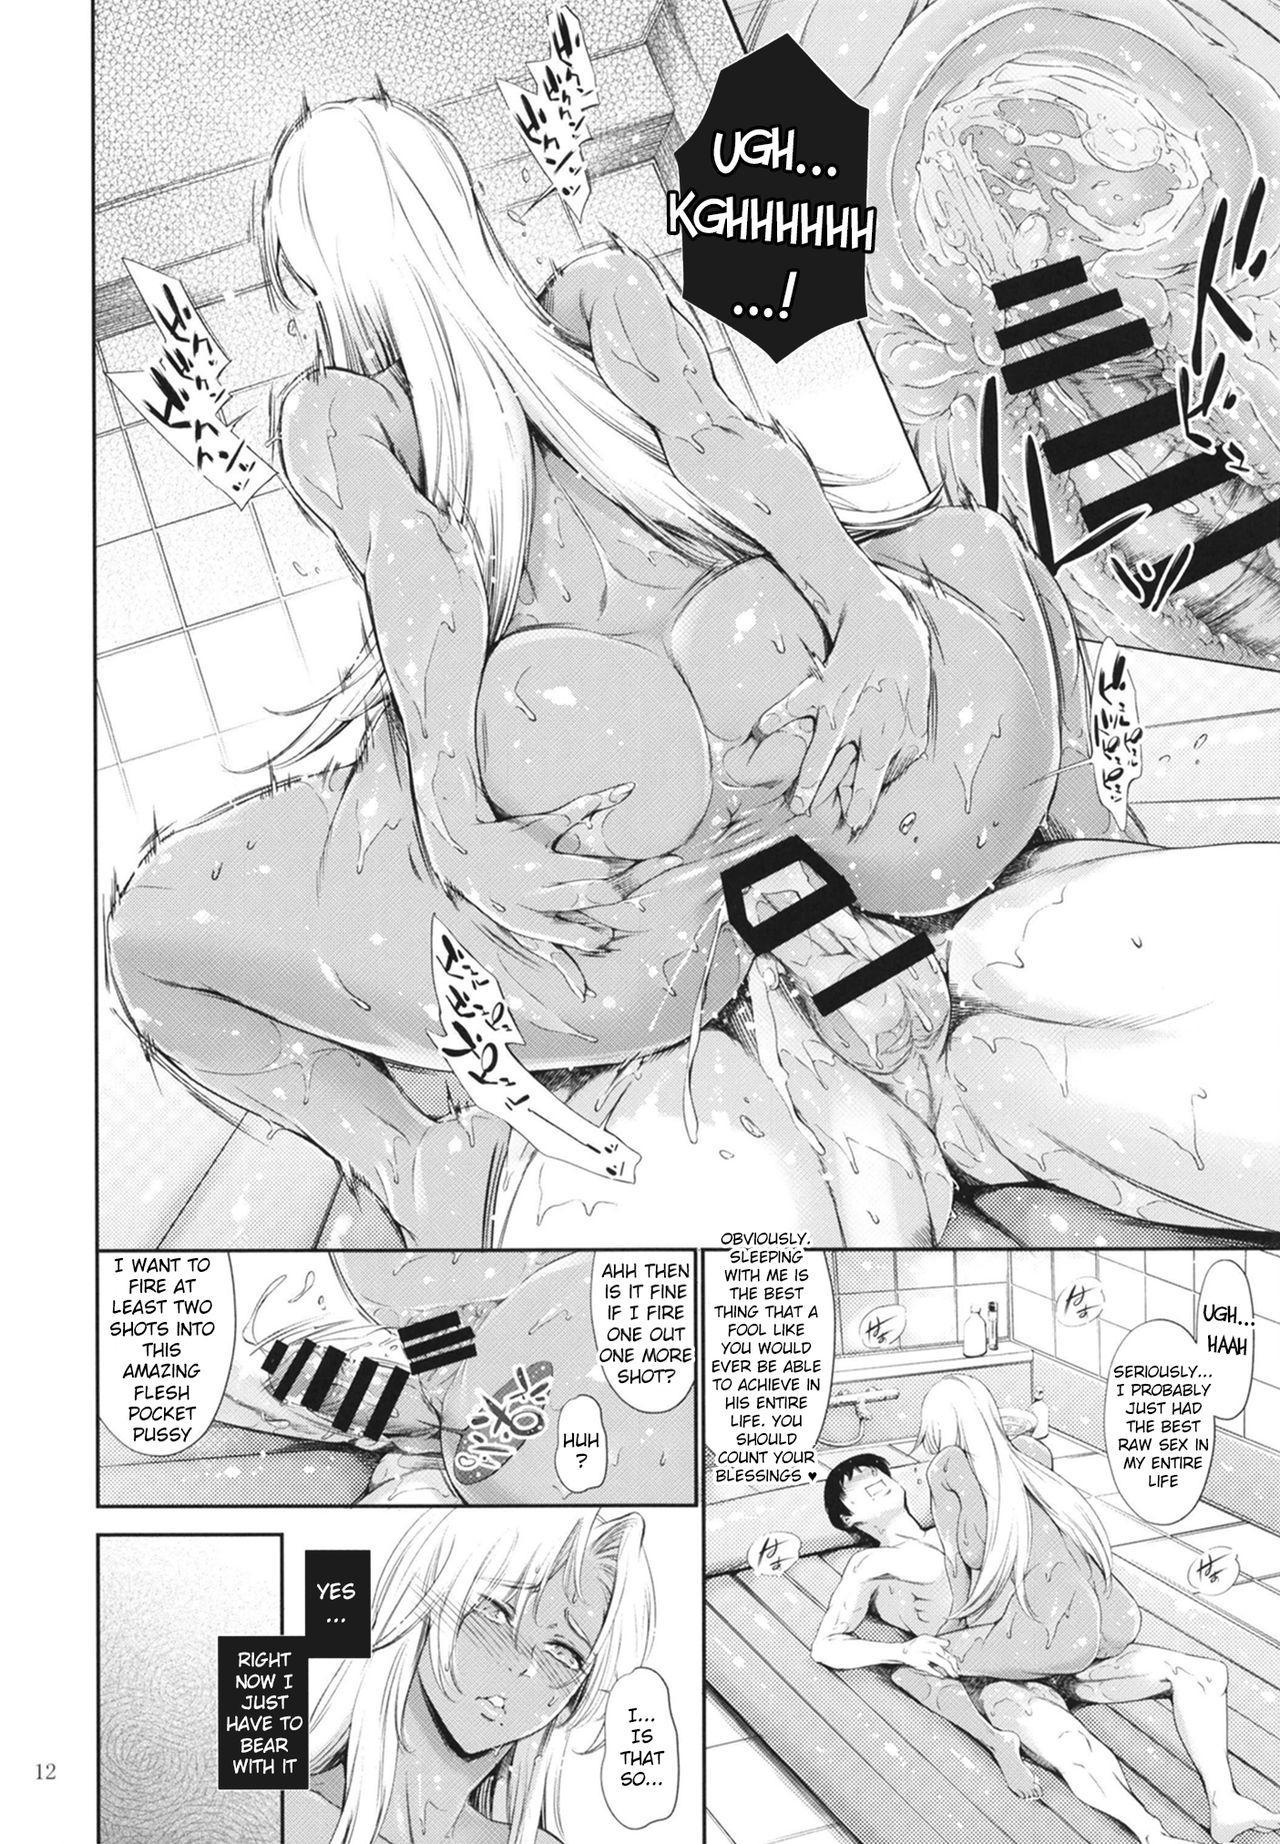 Makai Kishi Ingrid ni Nakadashi Dekiru Soapland   A Soapland Where You Can Creampie Dark Knight Ingrid 11